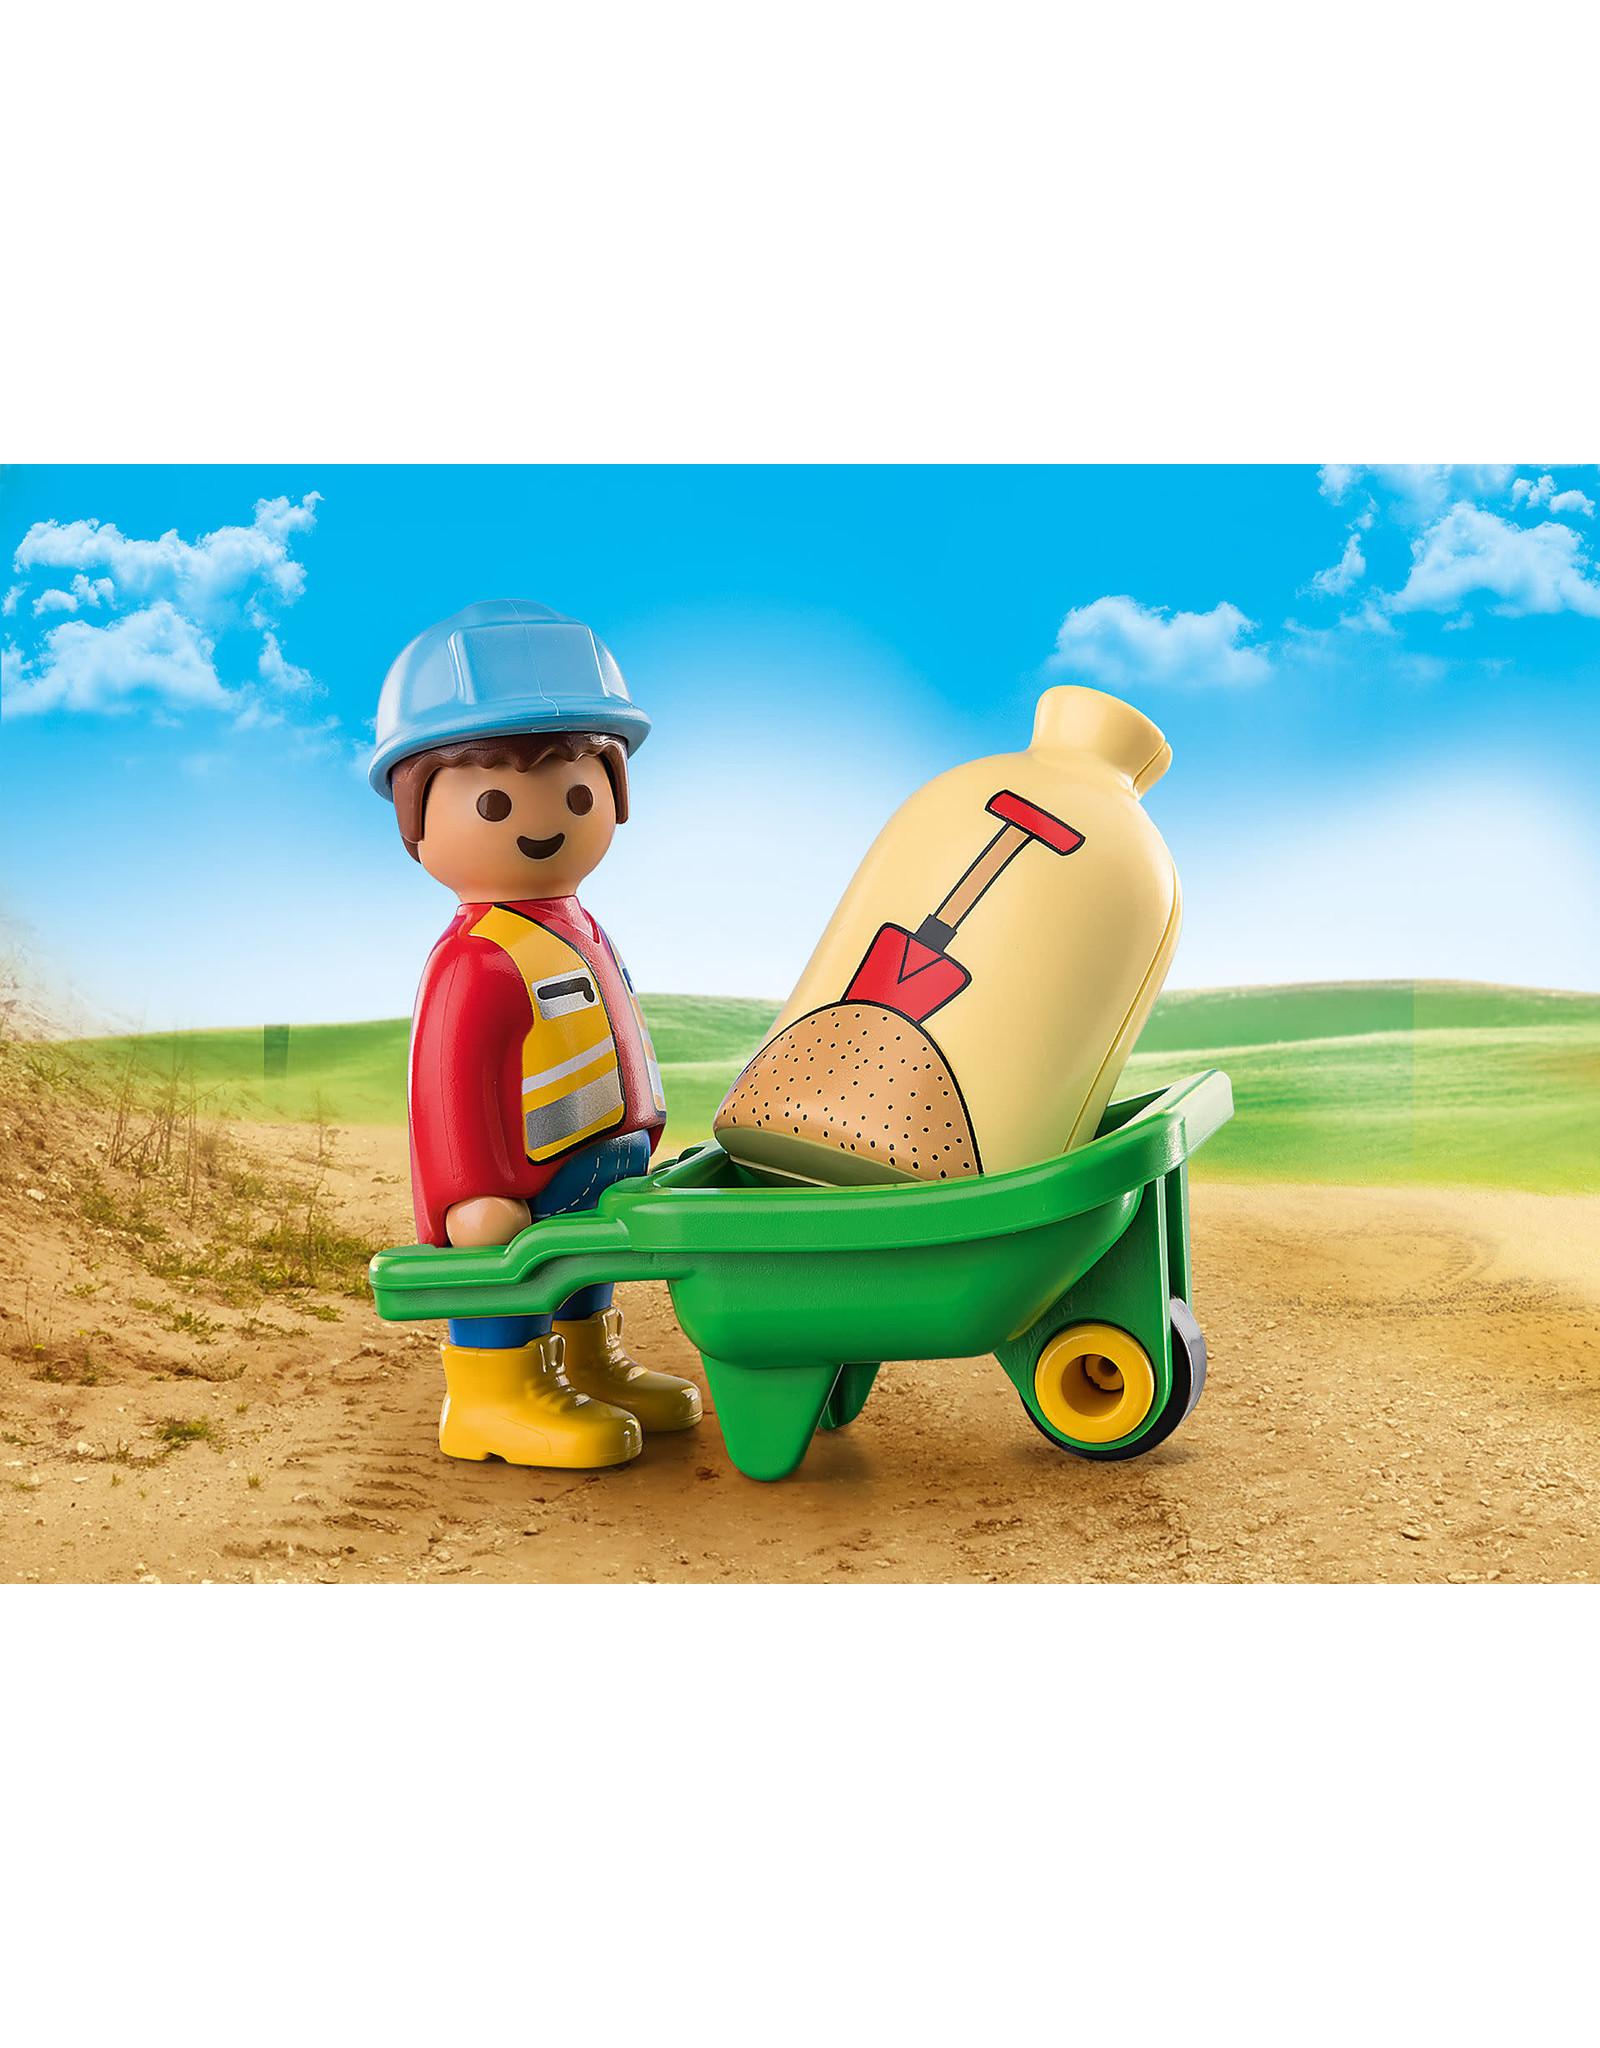 Playmobil 1.2.3 Construction Worker With Wheelbarrow